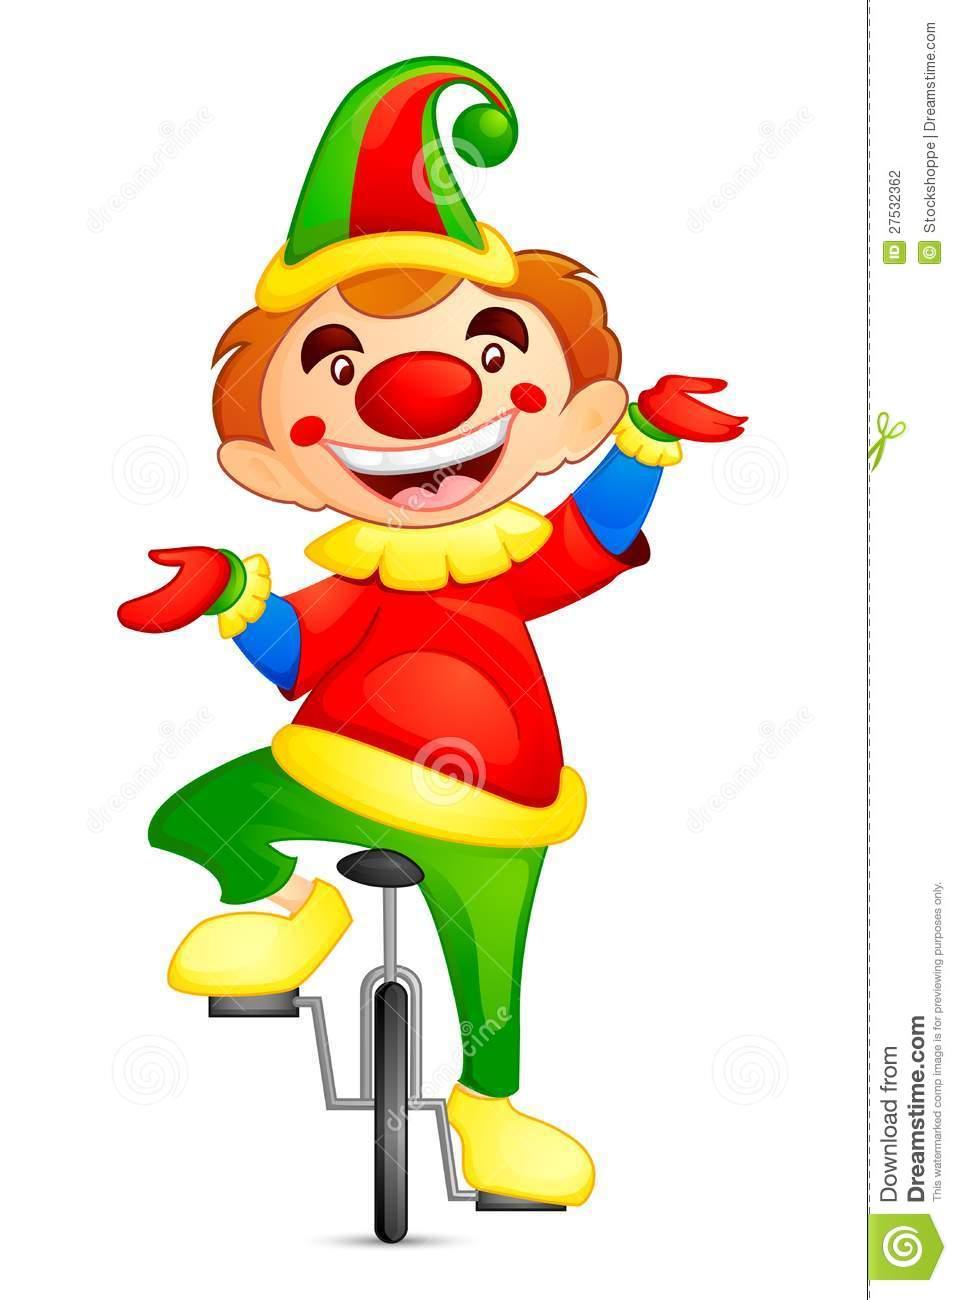 Circus joker clipart banner free stock Circus Joker Stock Photography - Image: 27532362 banner free stock